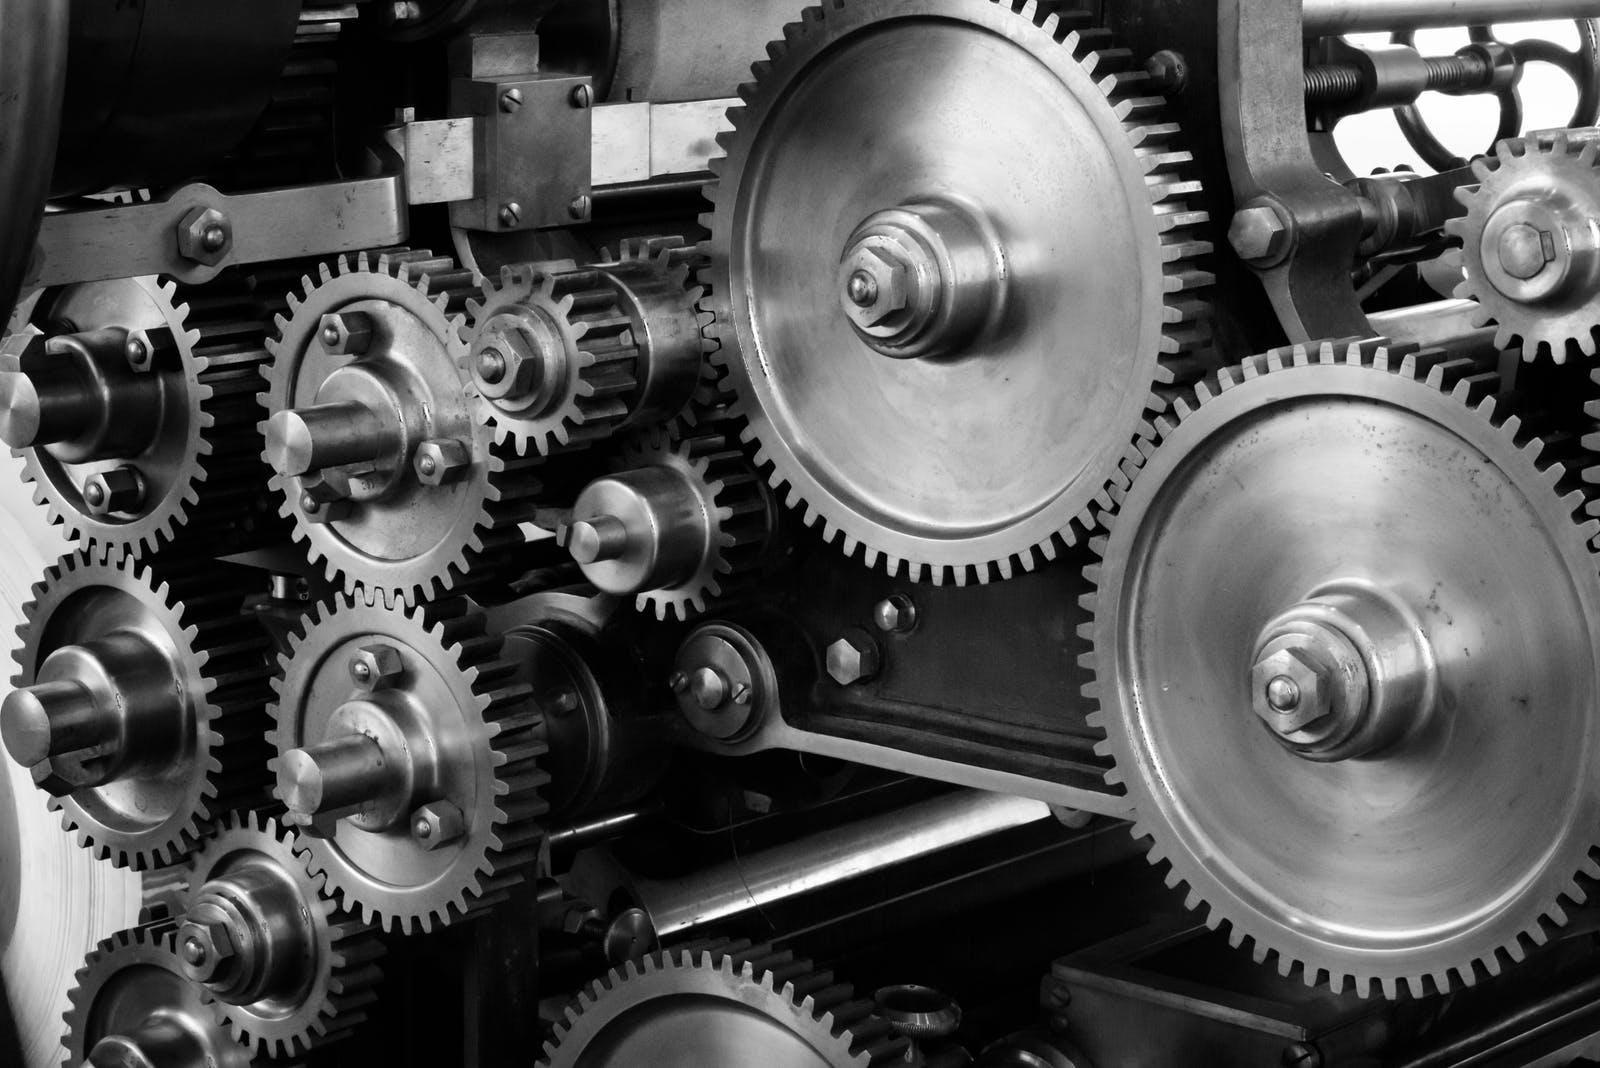 127264_gears-cogs-machine-machinery-159298.jpeg